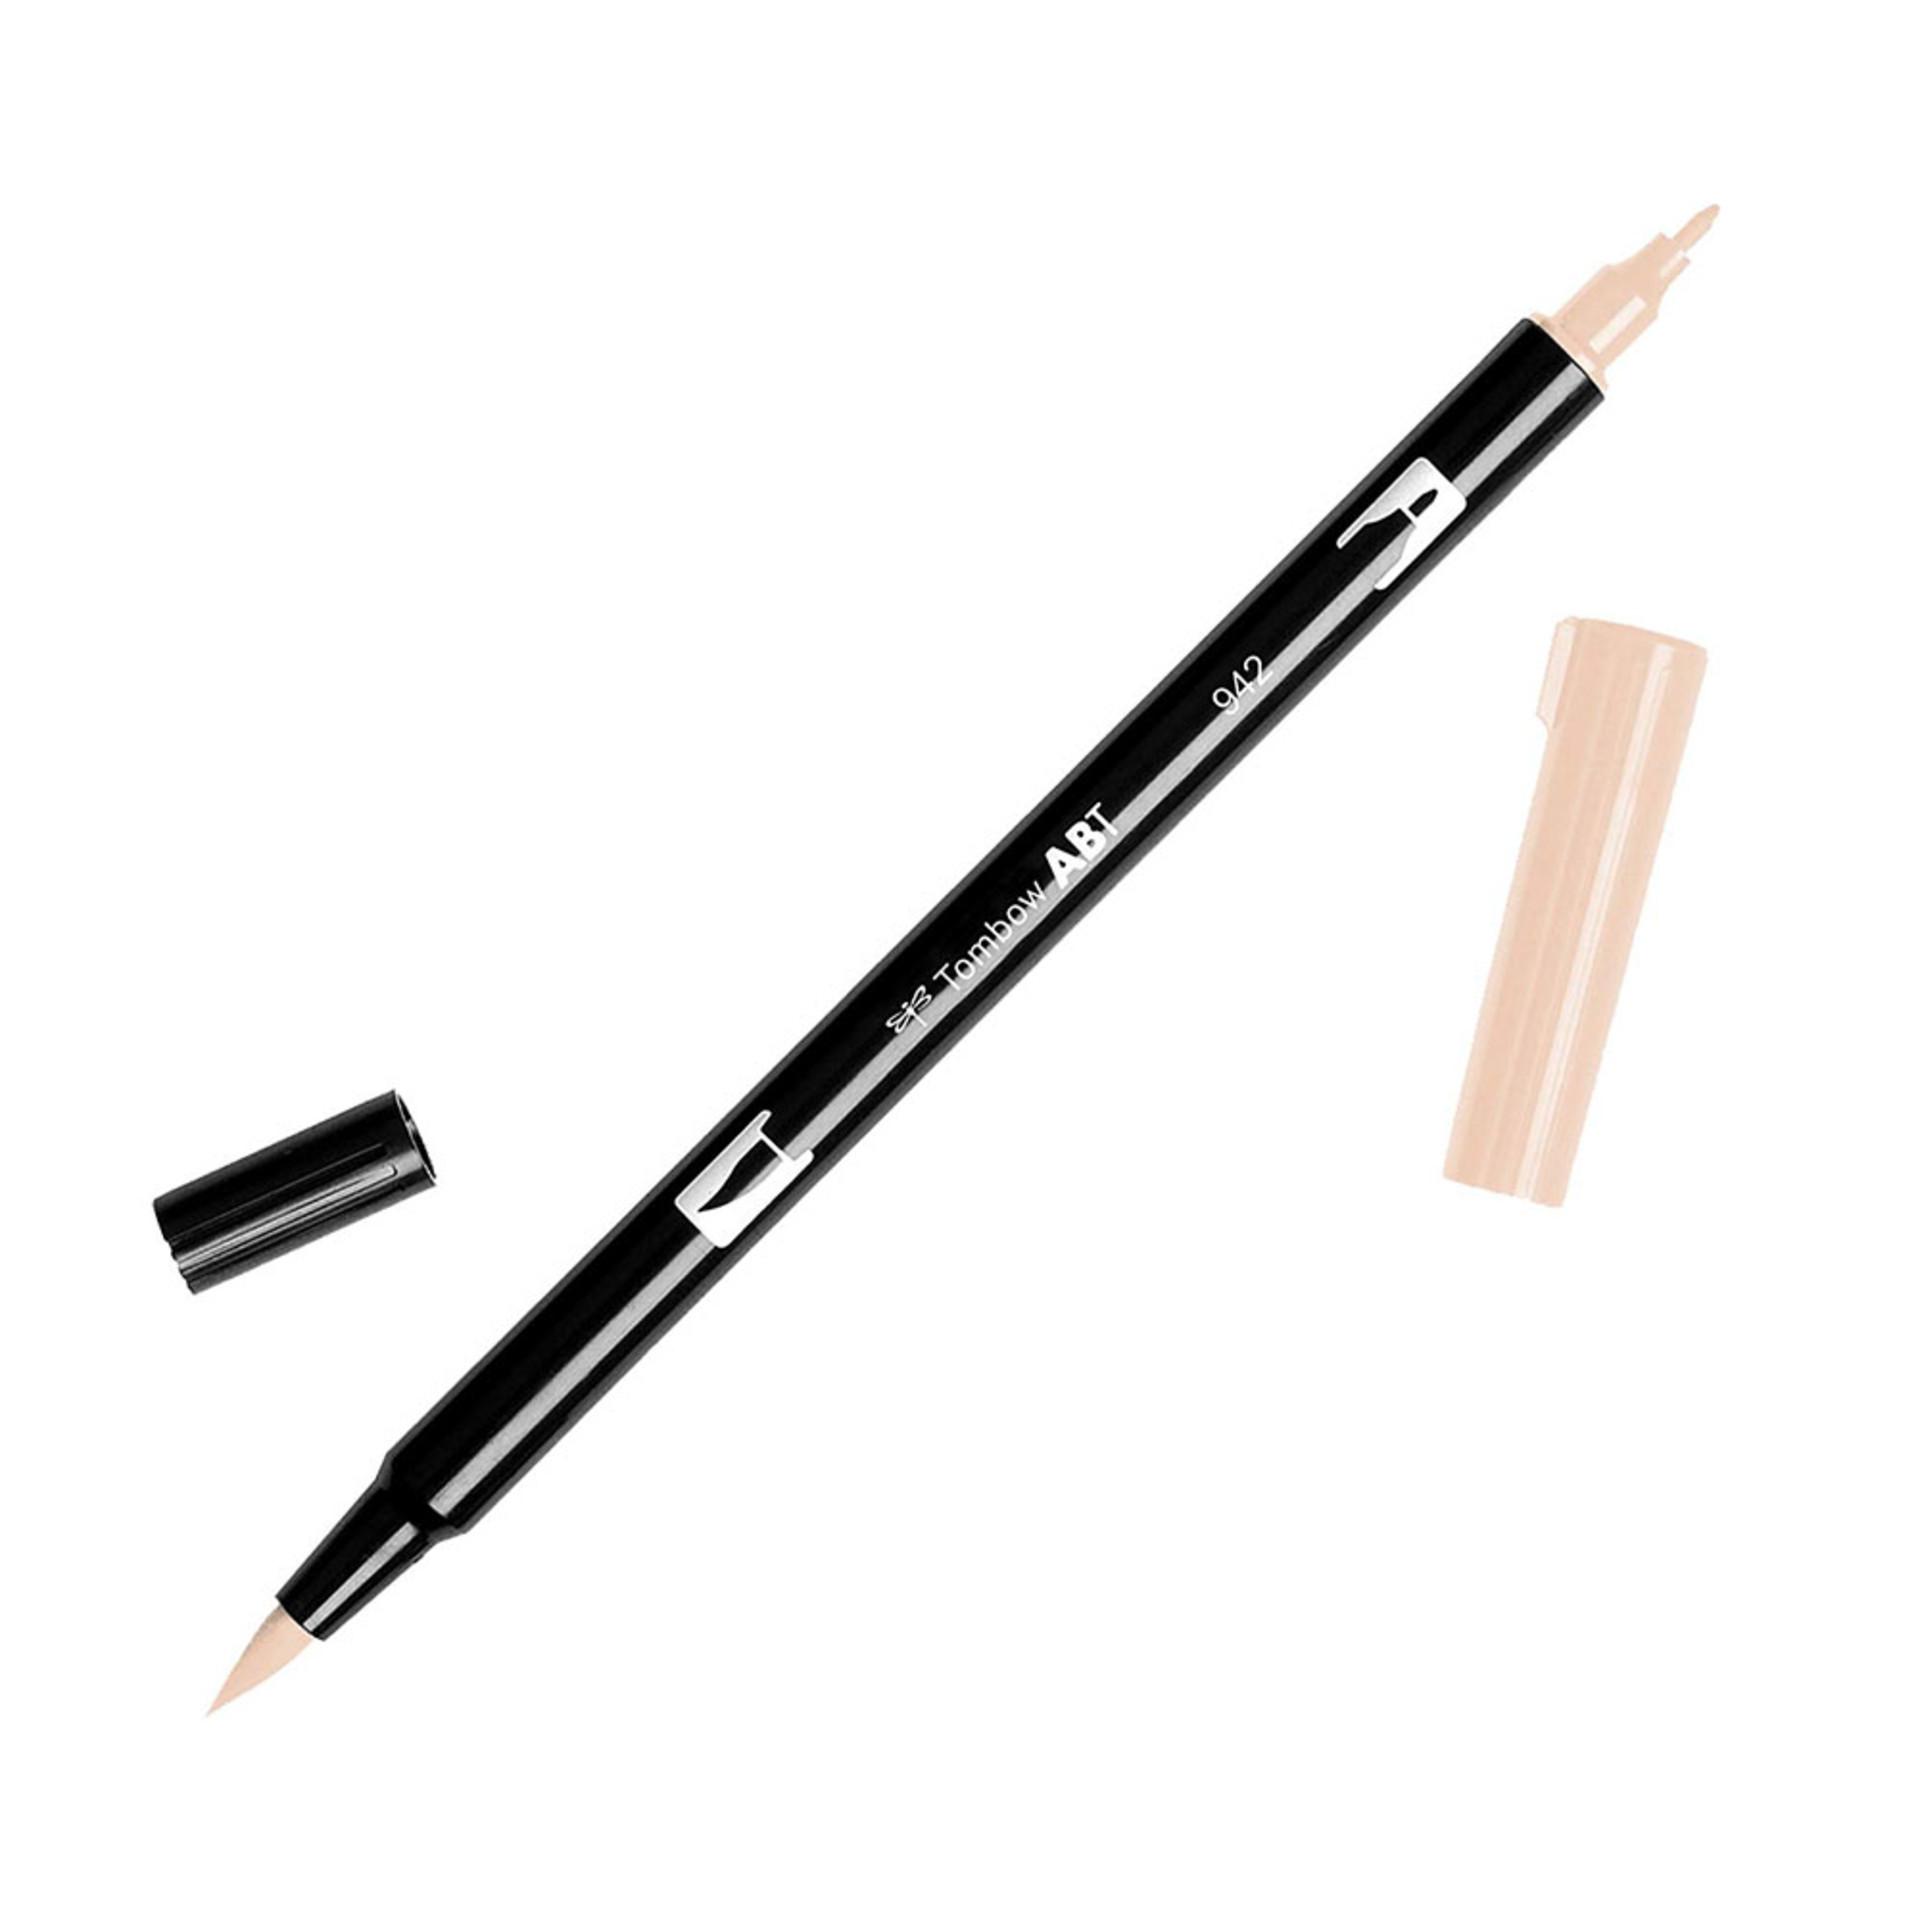 Tombow Dual-Tip Brush Marker Pen – Tan